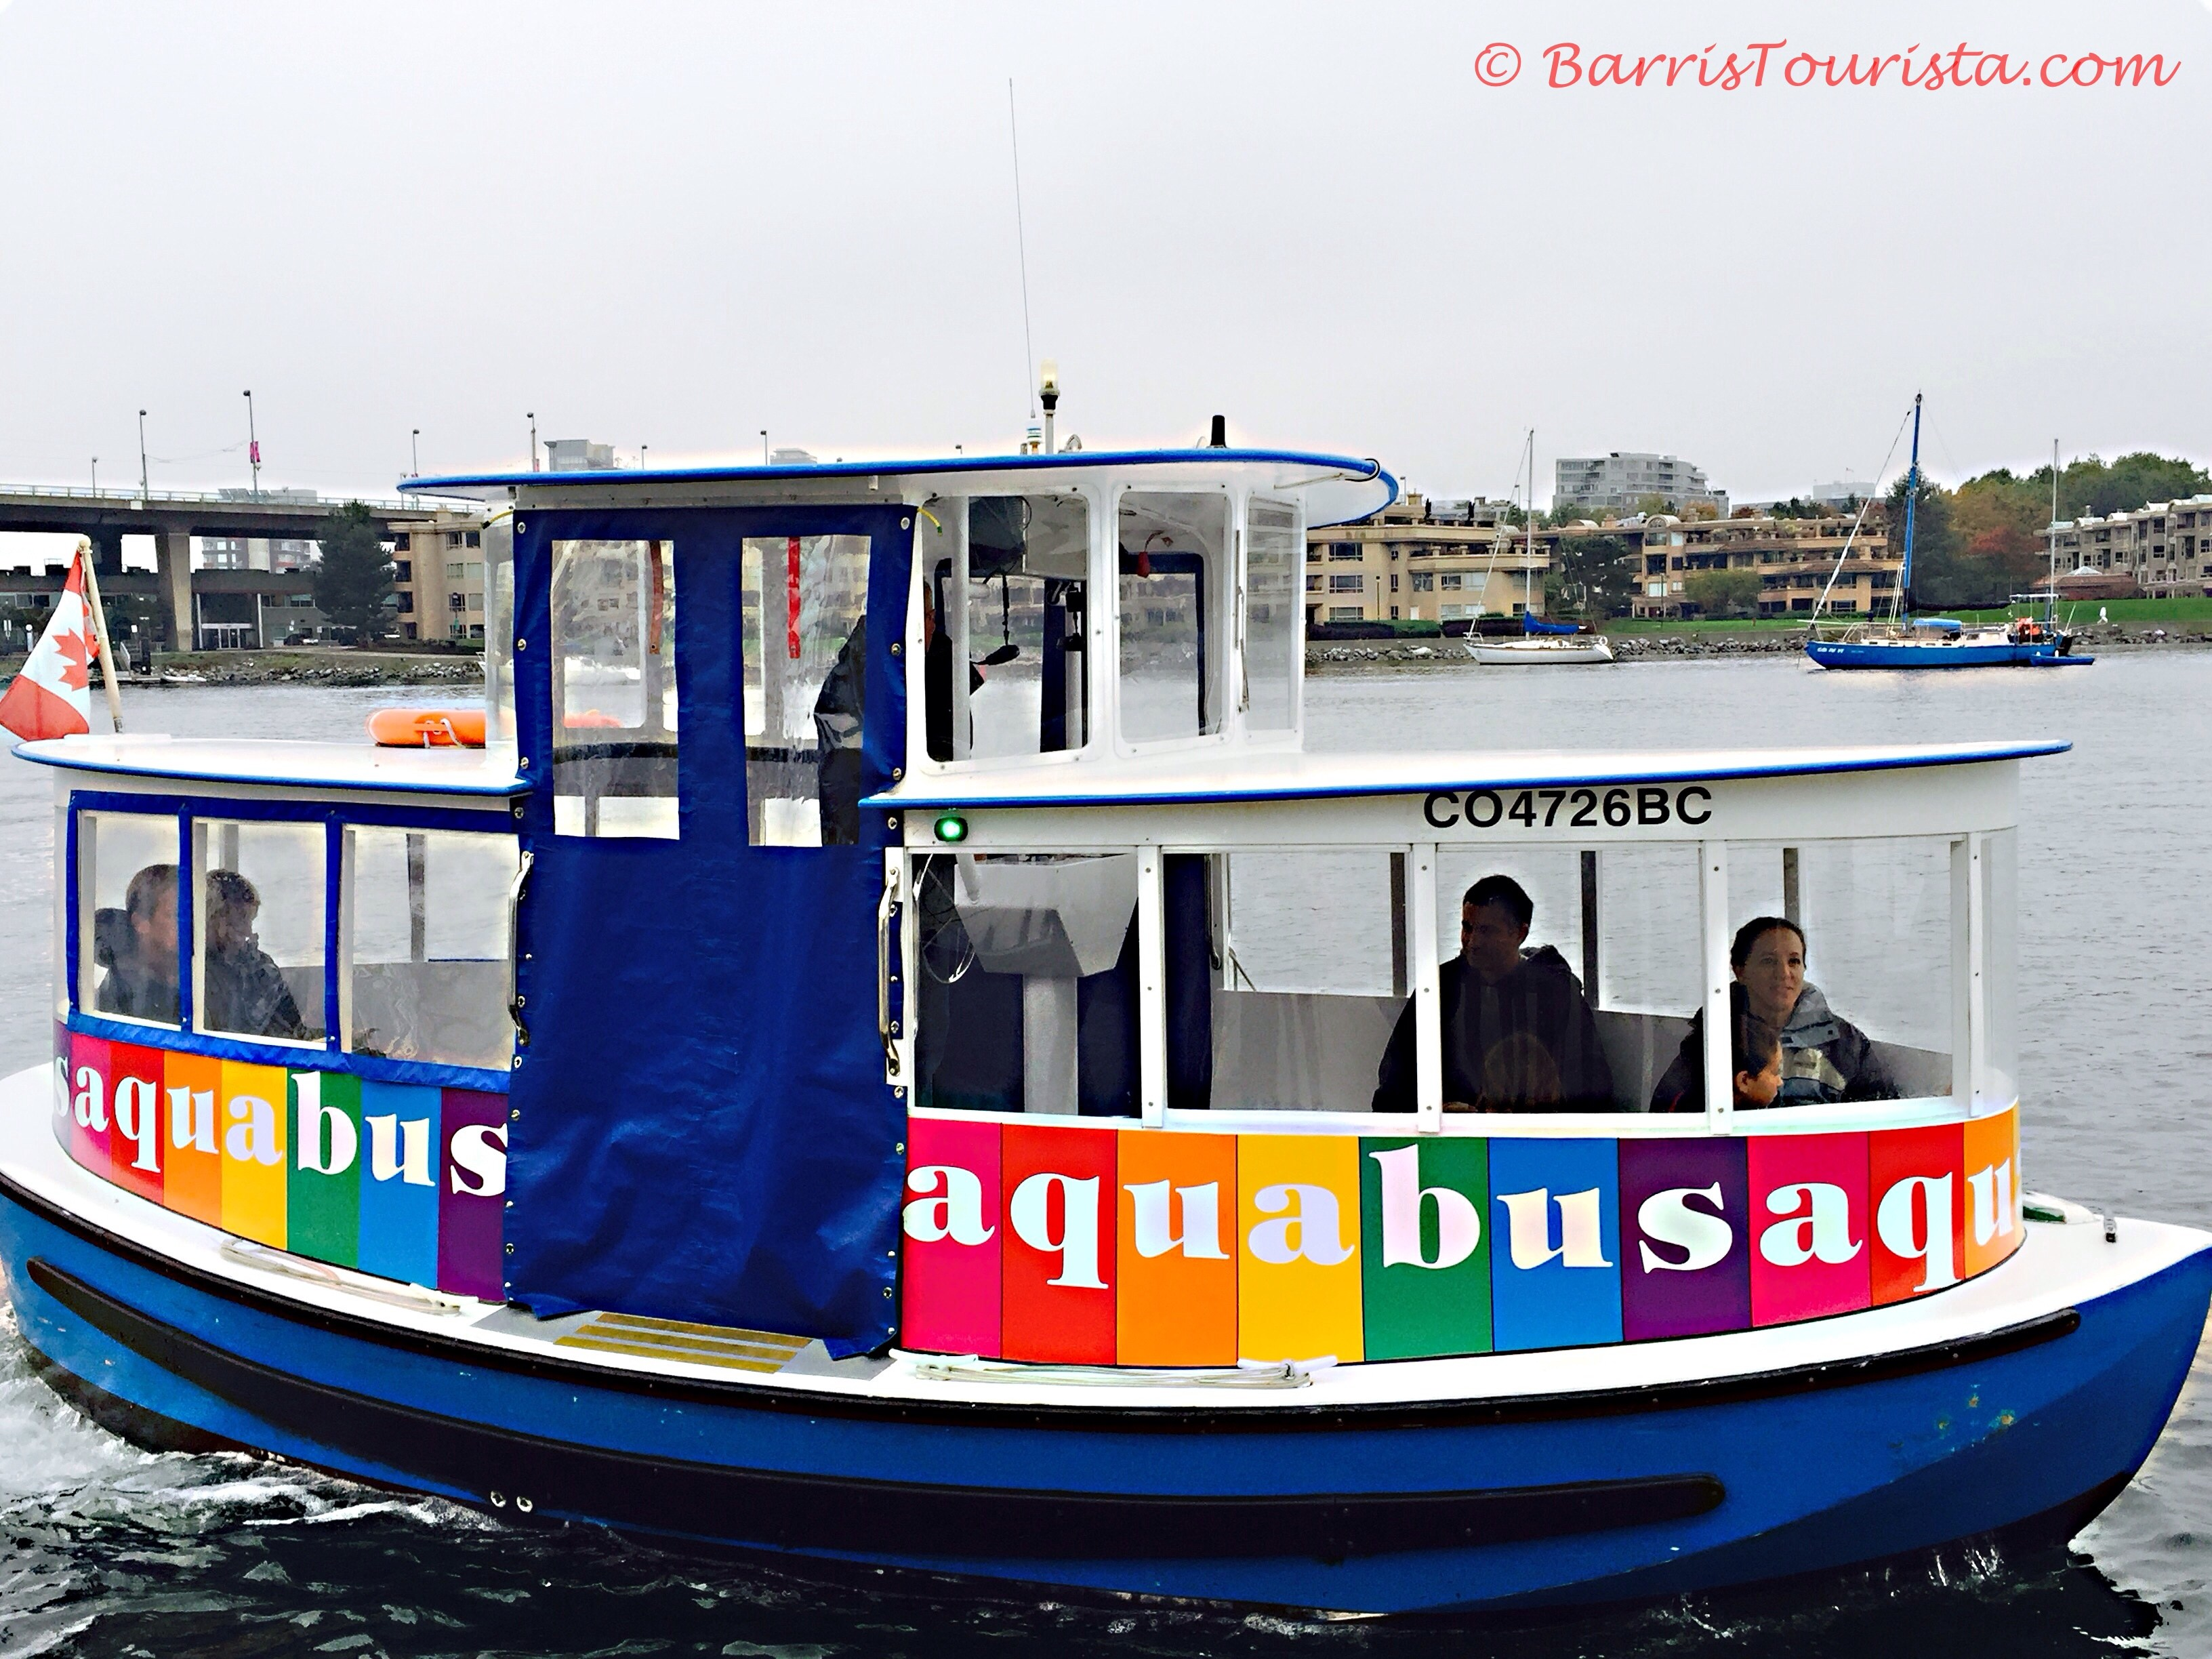 BarrisTourista Aquabus